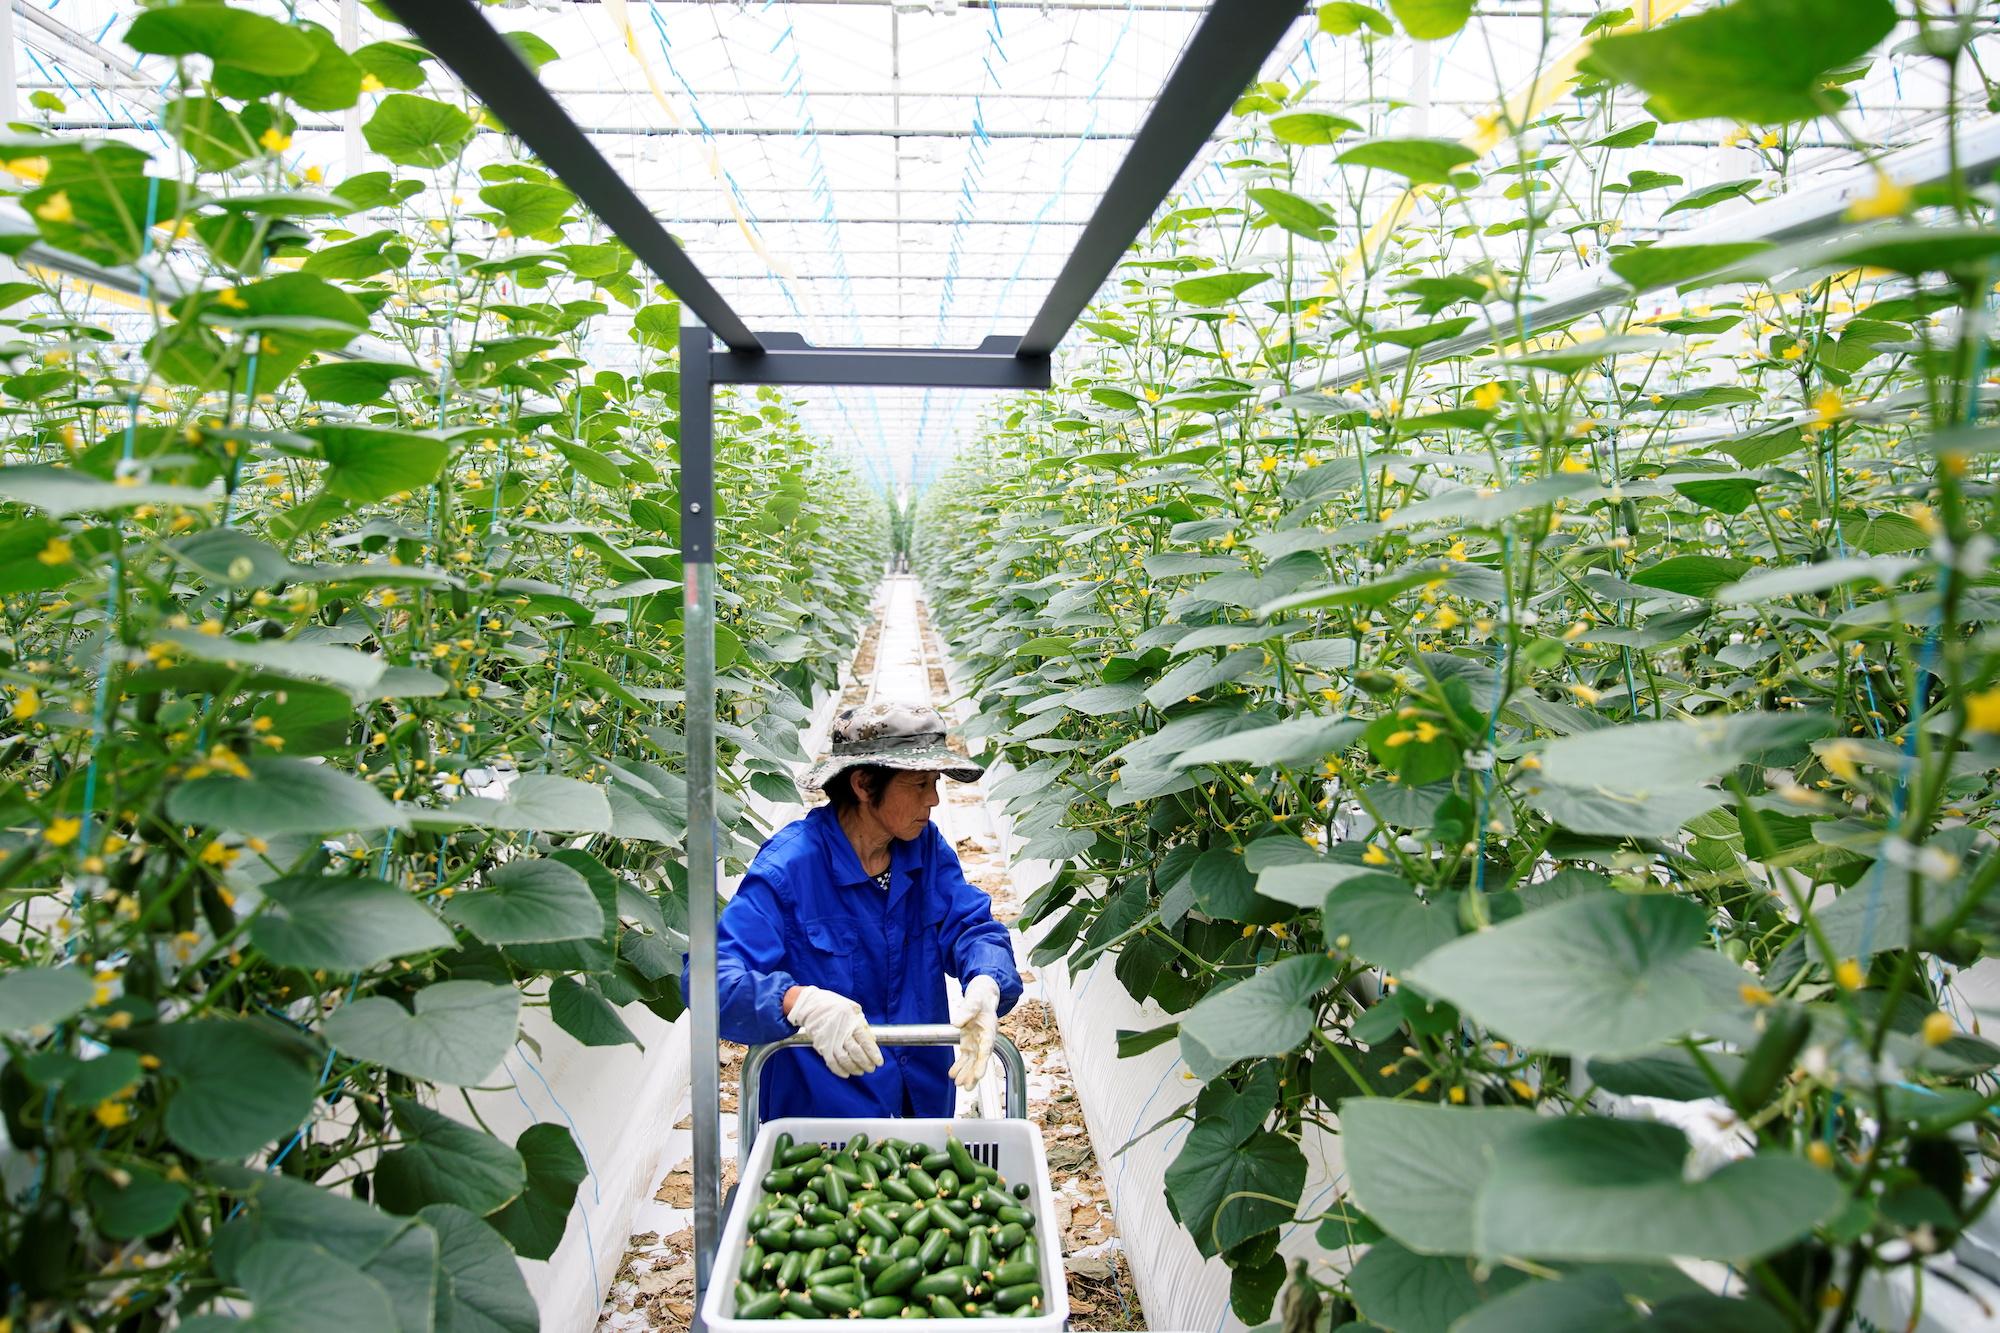 A farmer gathers cucumbers at Hengda greenhouse in Shanghai